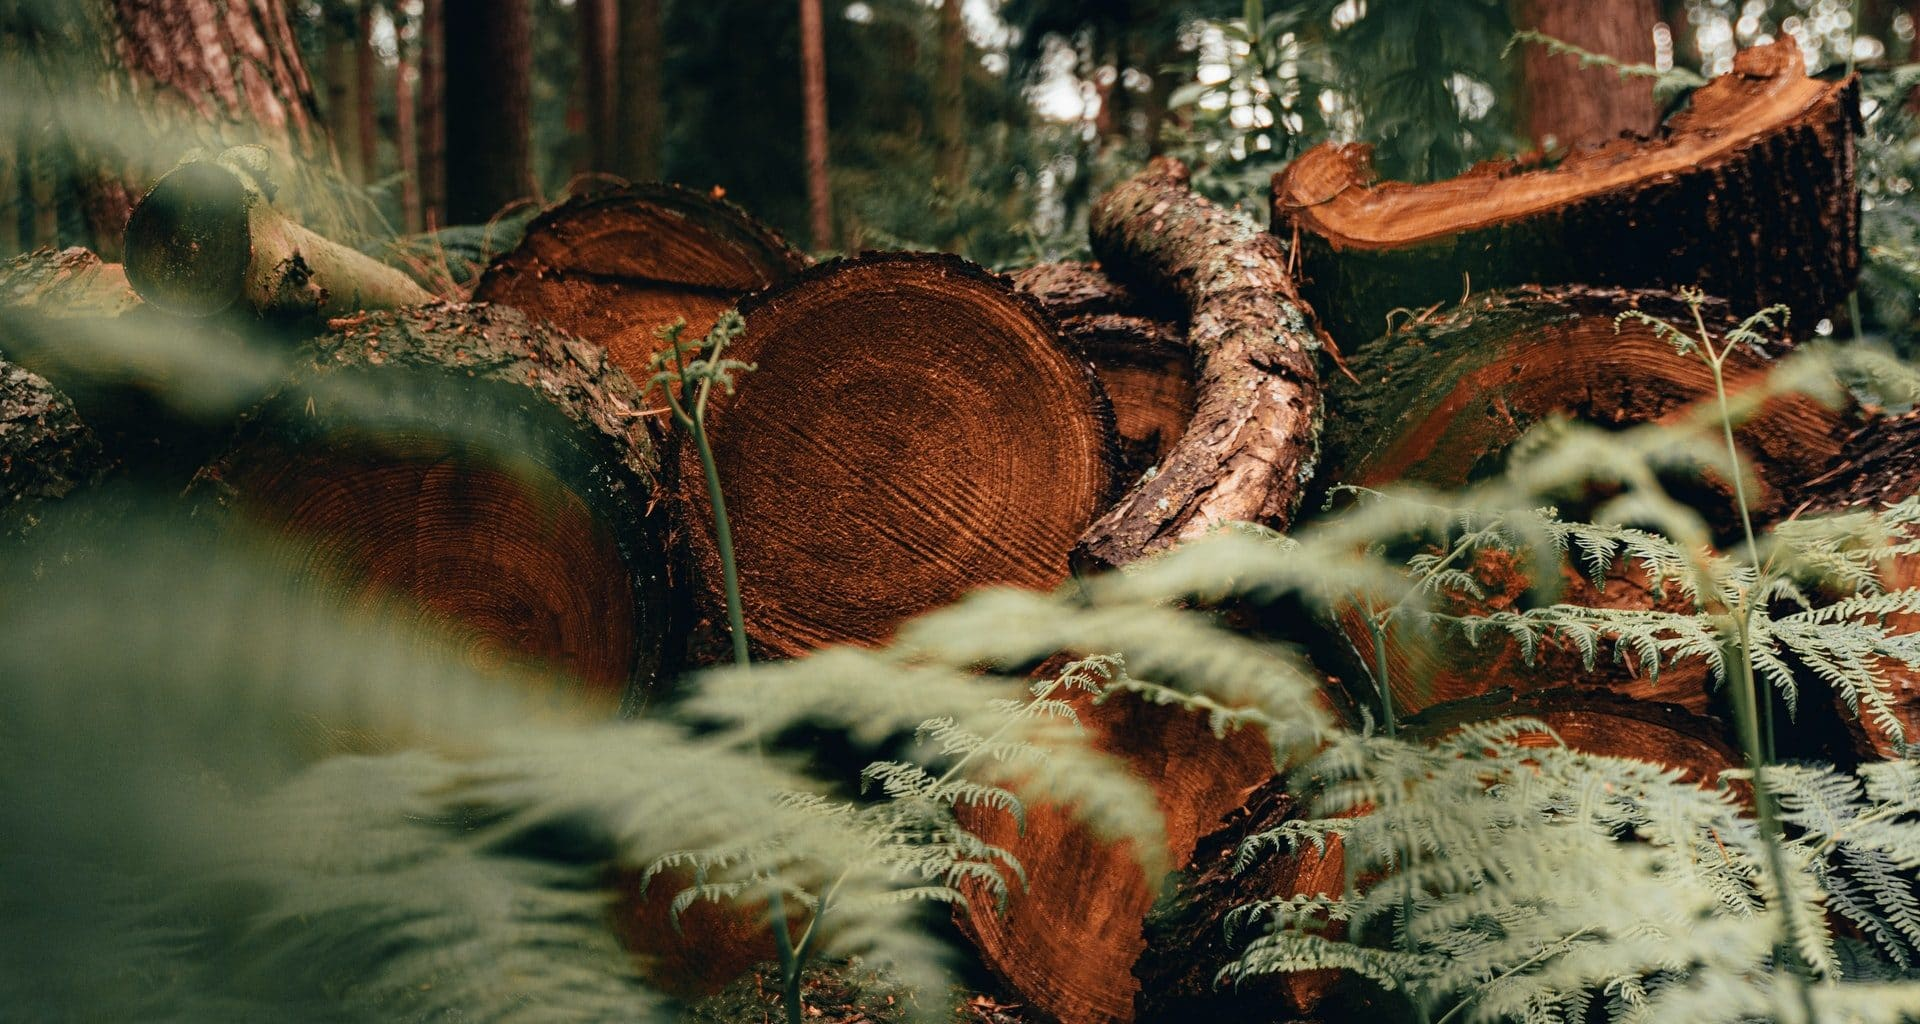 deforestation statistics - featured image